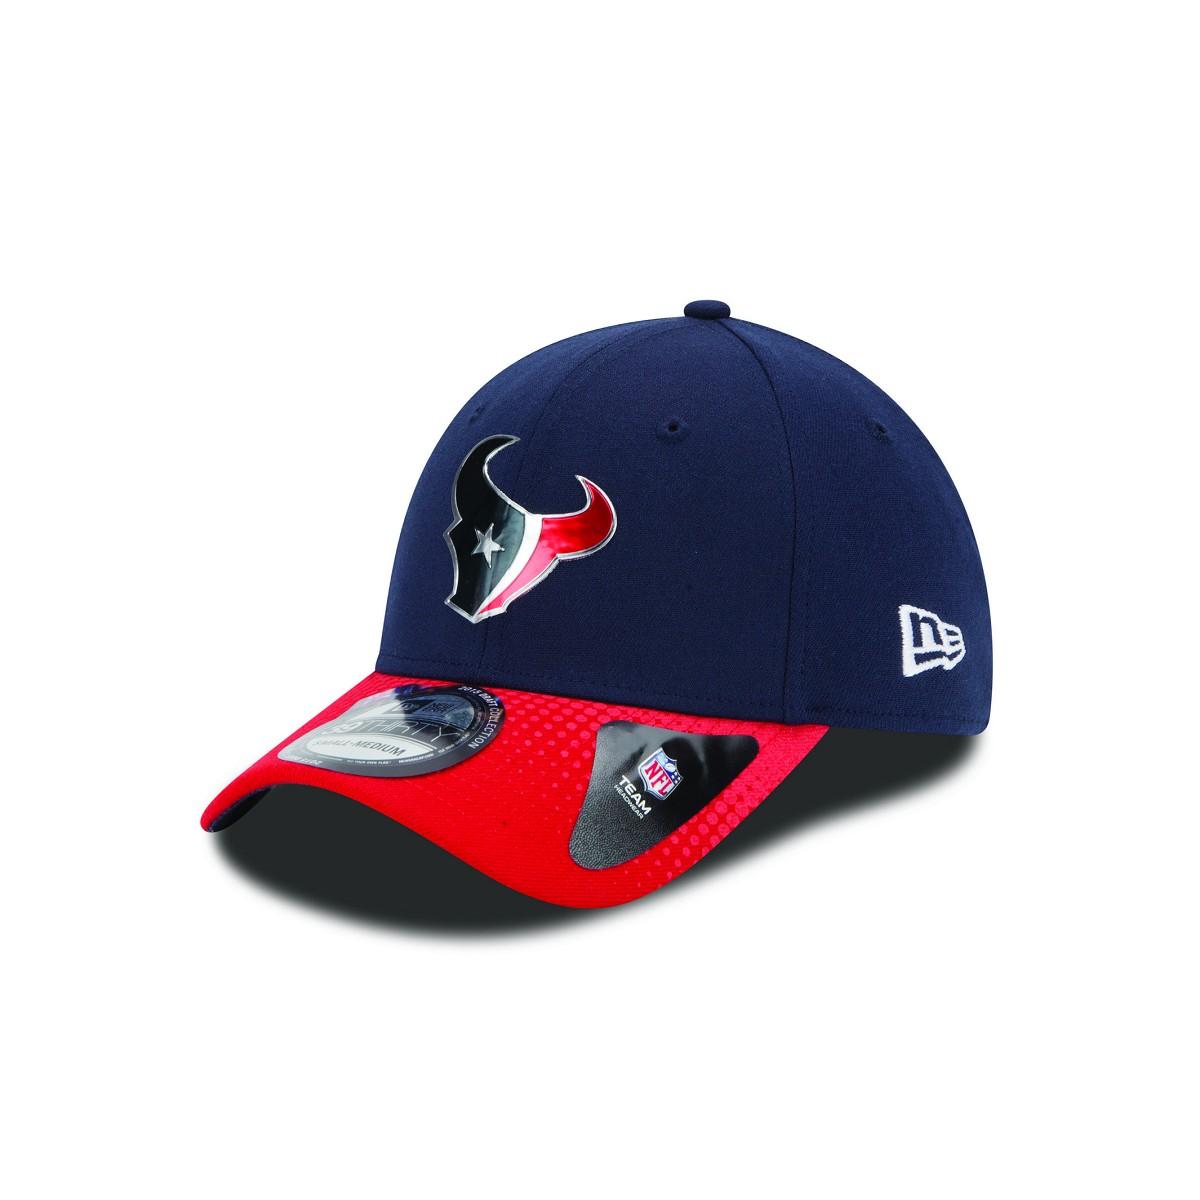 Cappello Houston Texans